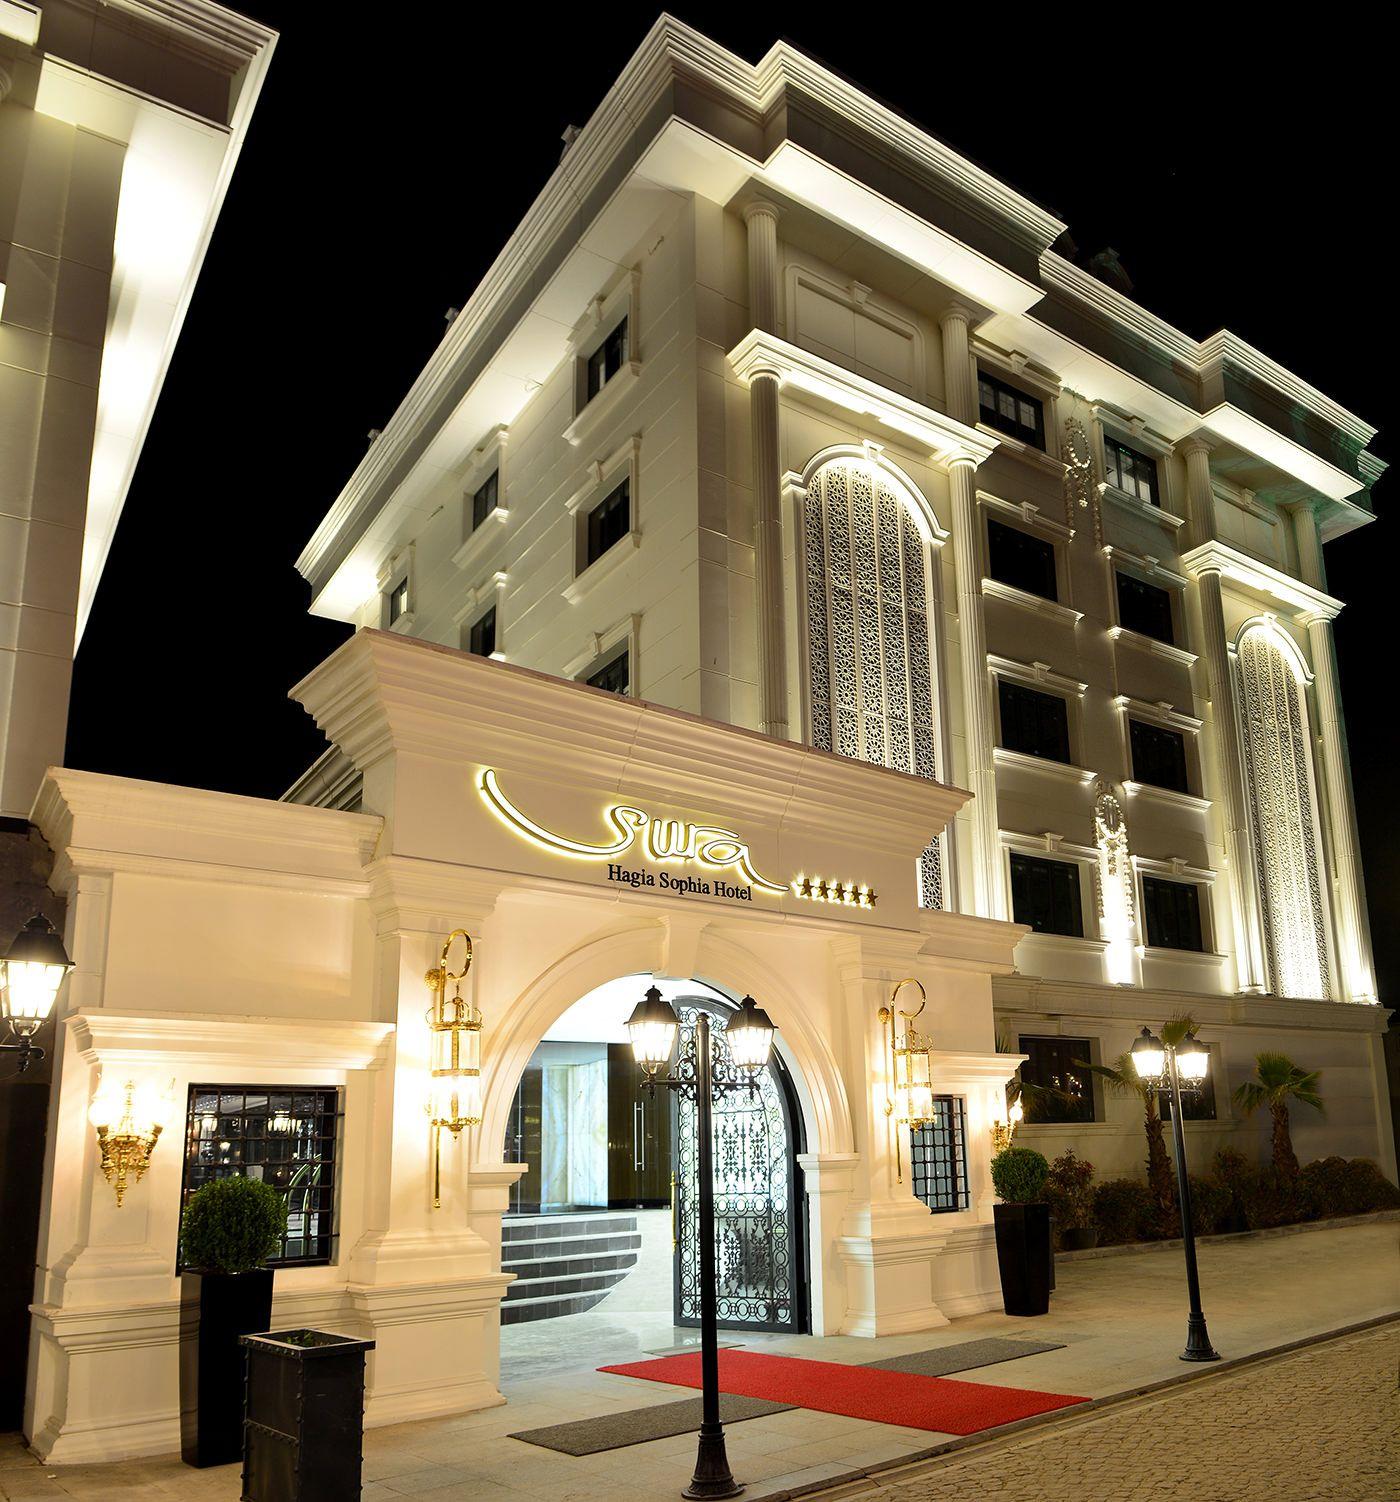 Sura Hagia Sophia Hotel Hotel Istanbul Hotels Hagia Sophia